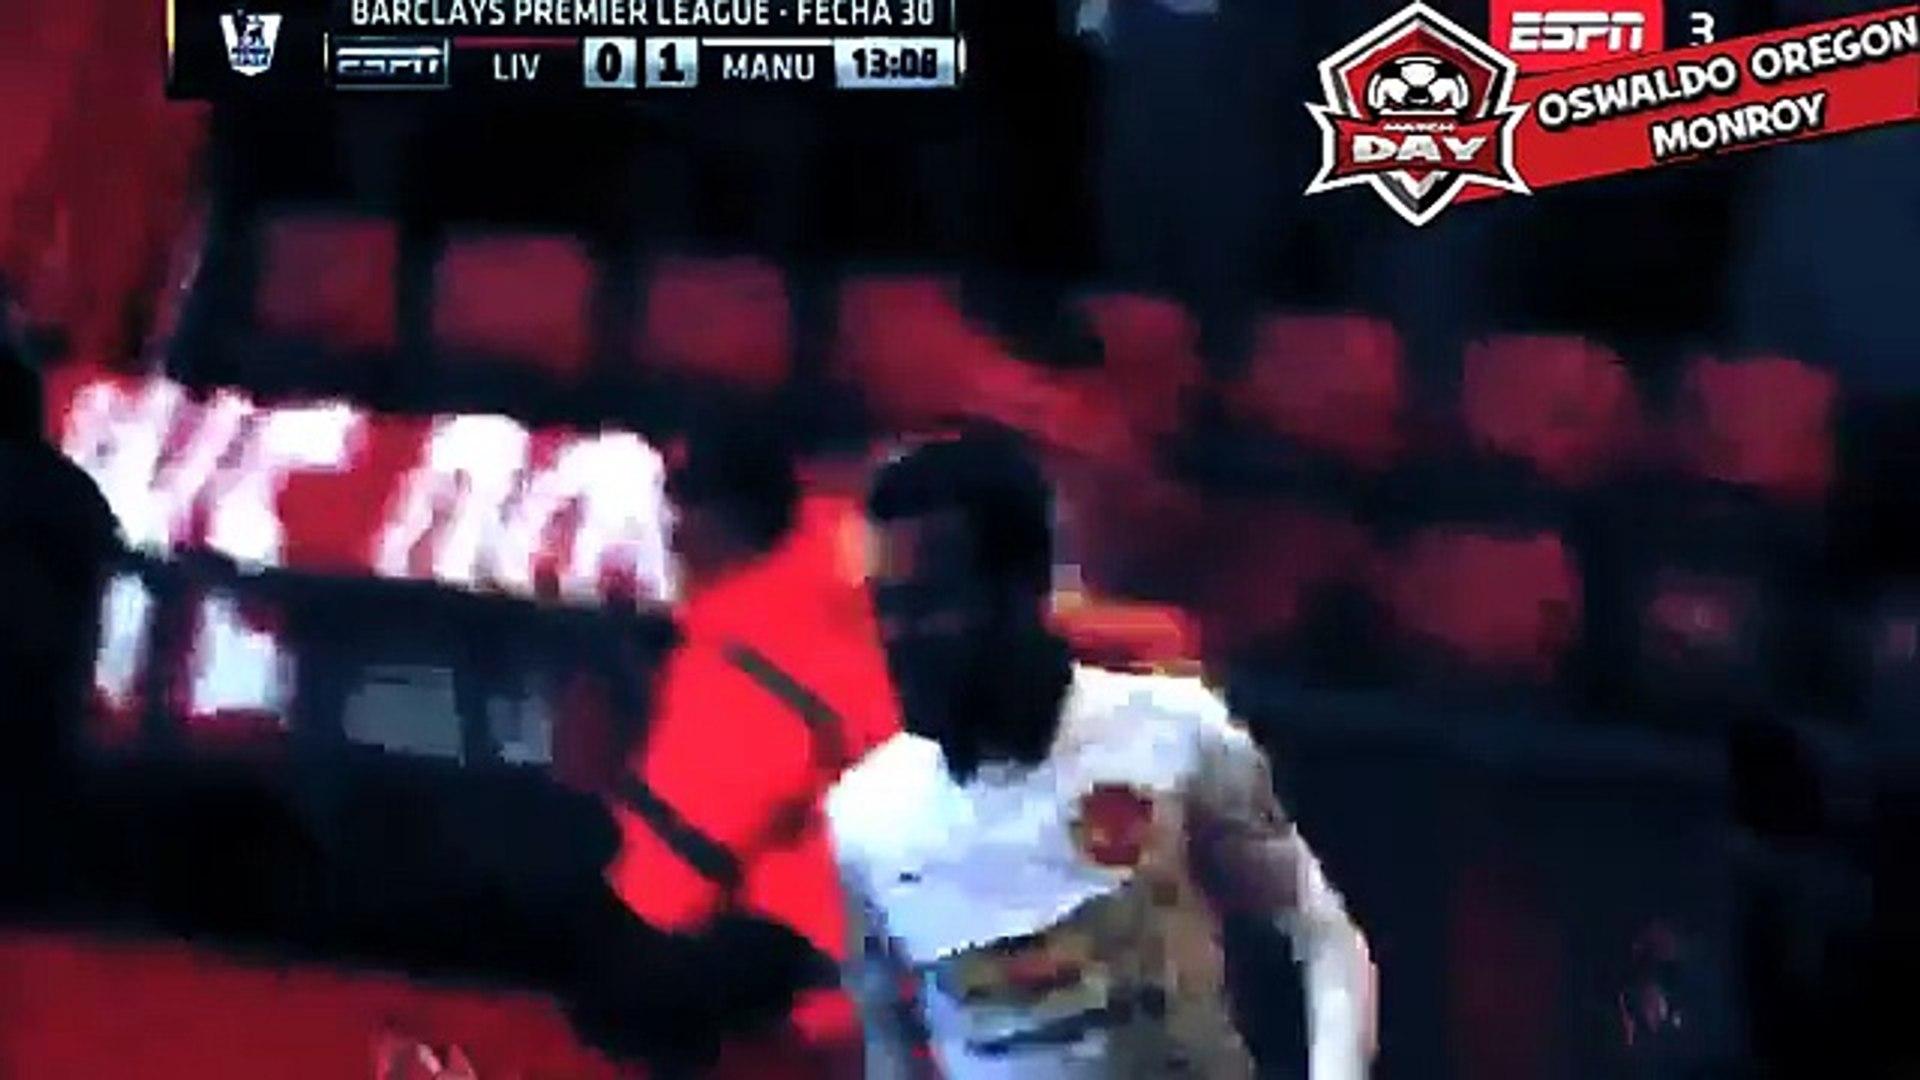 Juan Mata Goal - Liverpool vs Manchester United 0-1 2015 - Manchester United vs Liverpool 2015